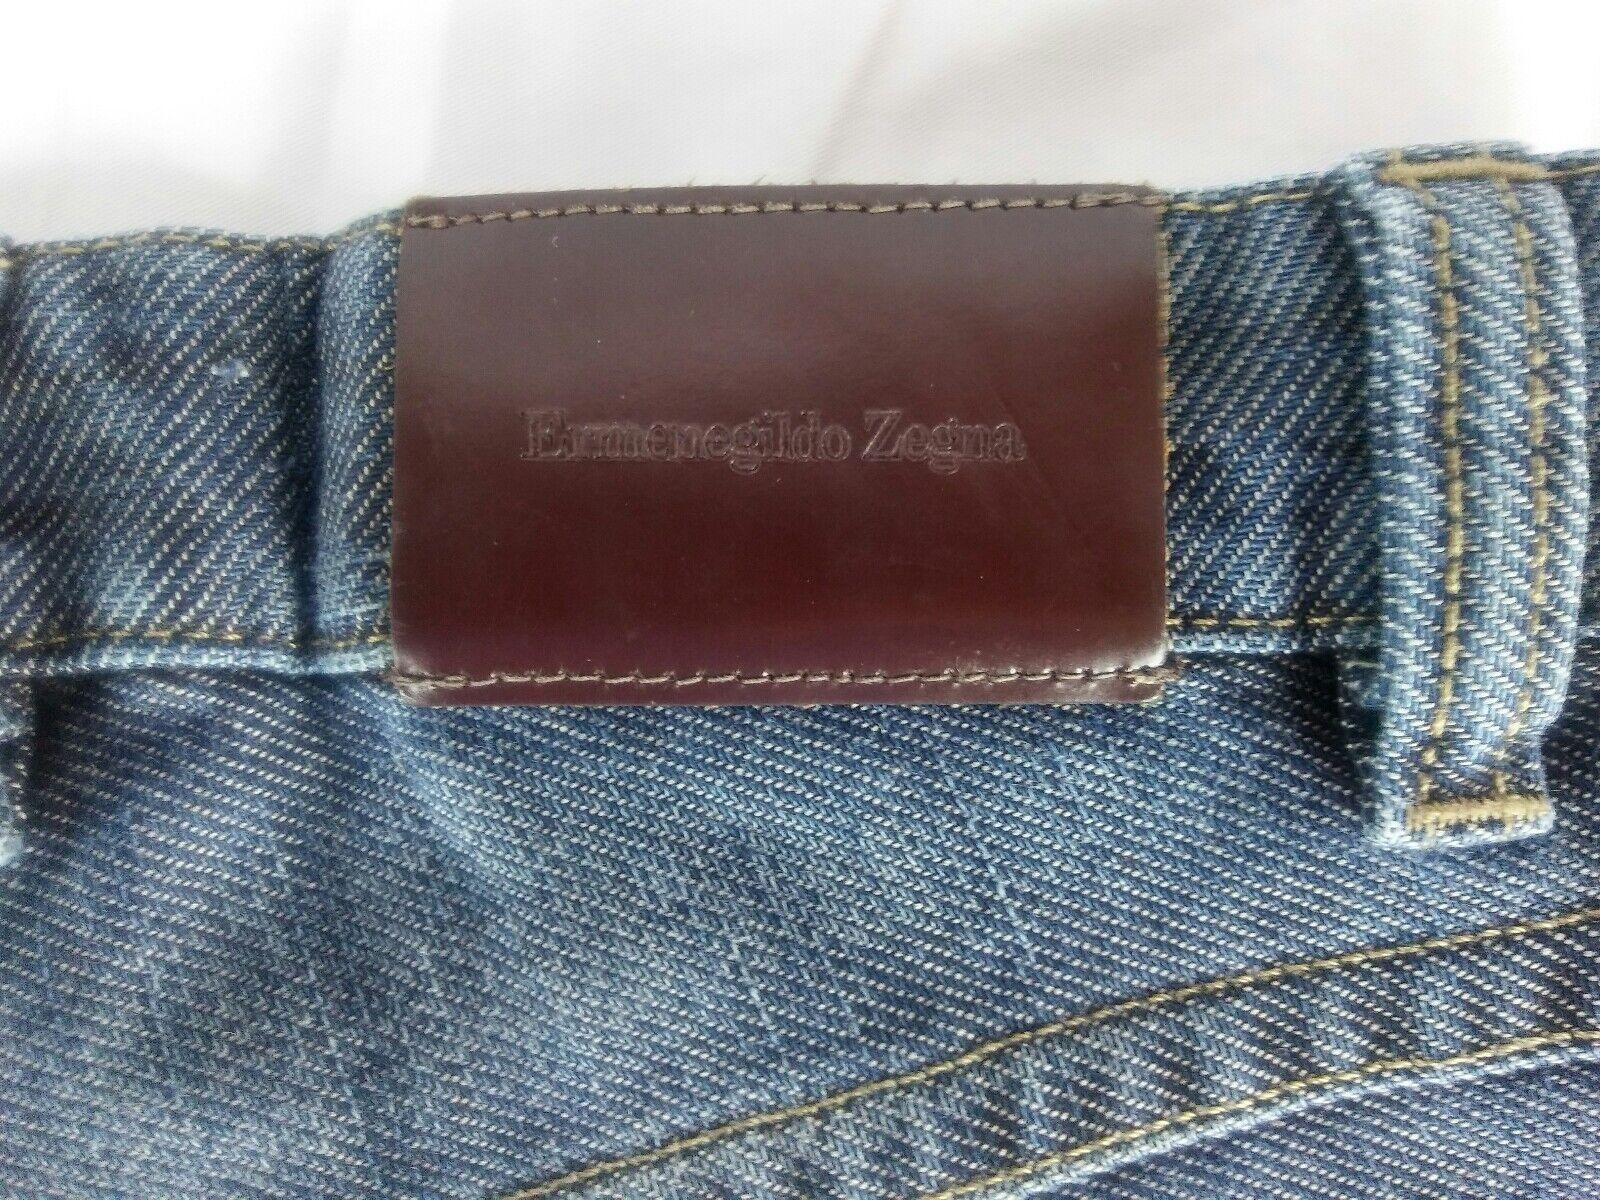 Ermenegildo Zegna Denim bluee Jeans 33 Slim Skinny